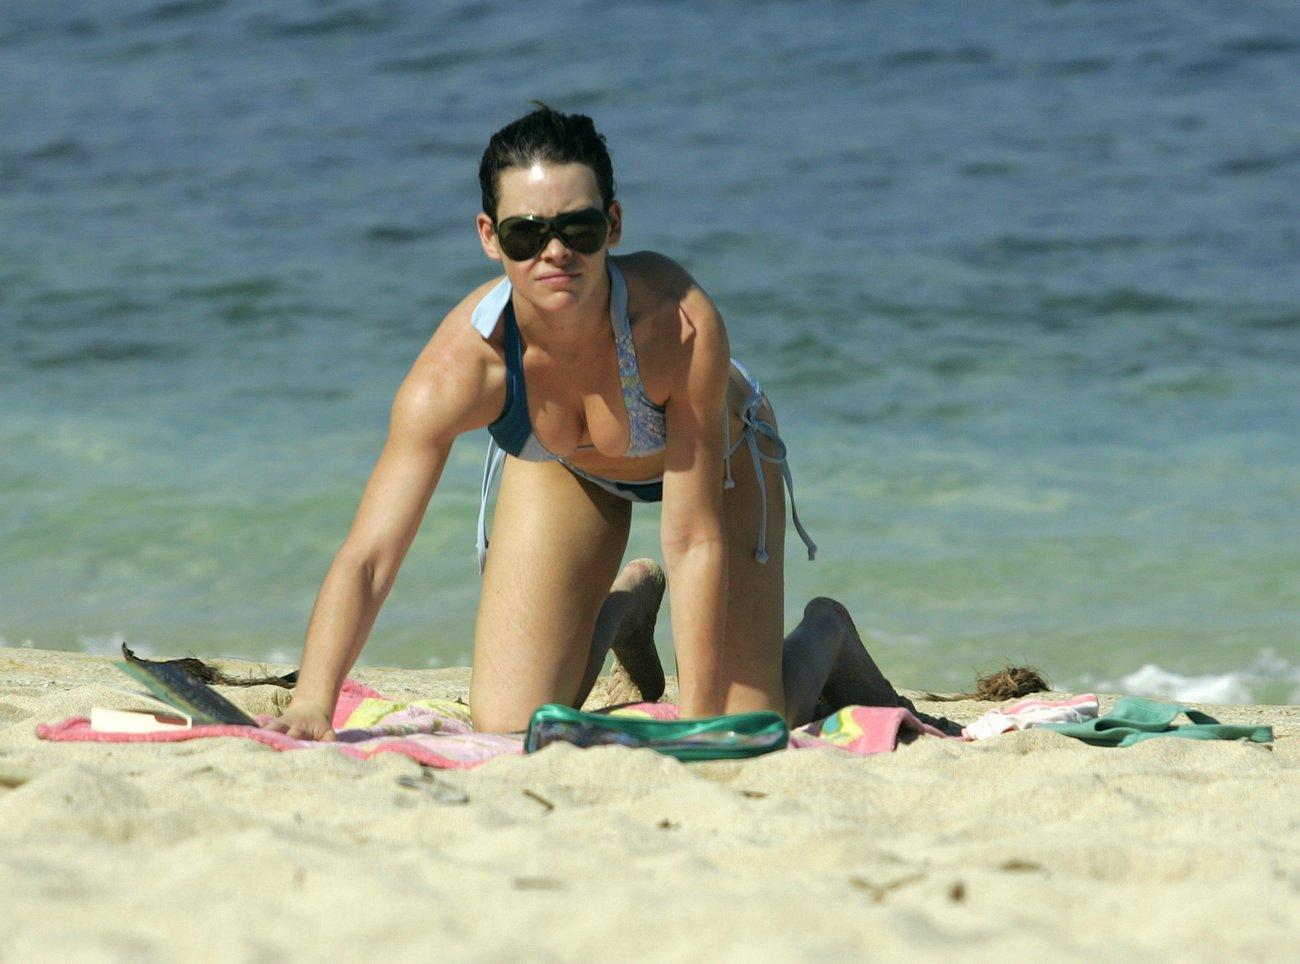 evangeline lilly hot bikini - photo #23